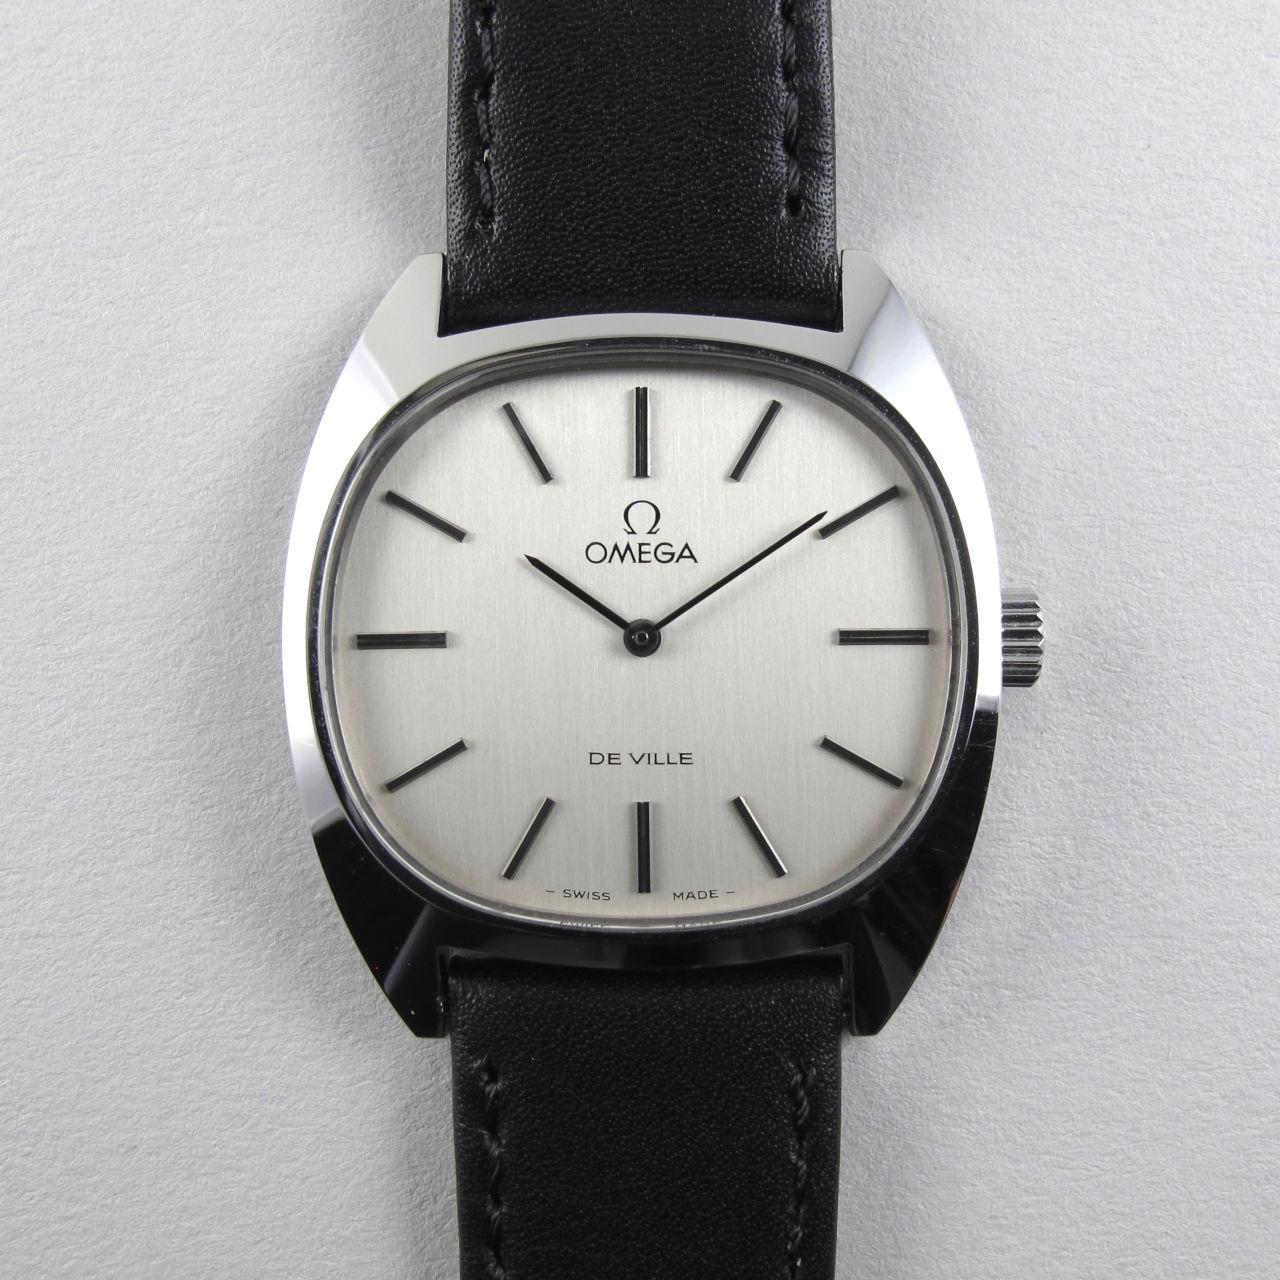 Omega de Ville Ref. 111.0132 steel vintage wristwatch, circa 1975